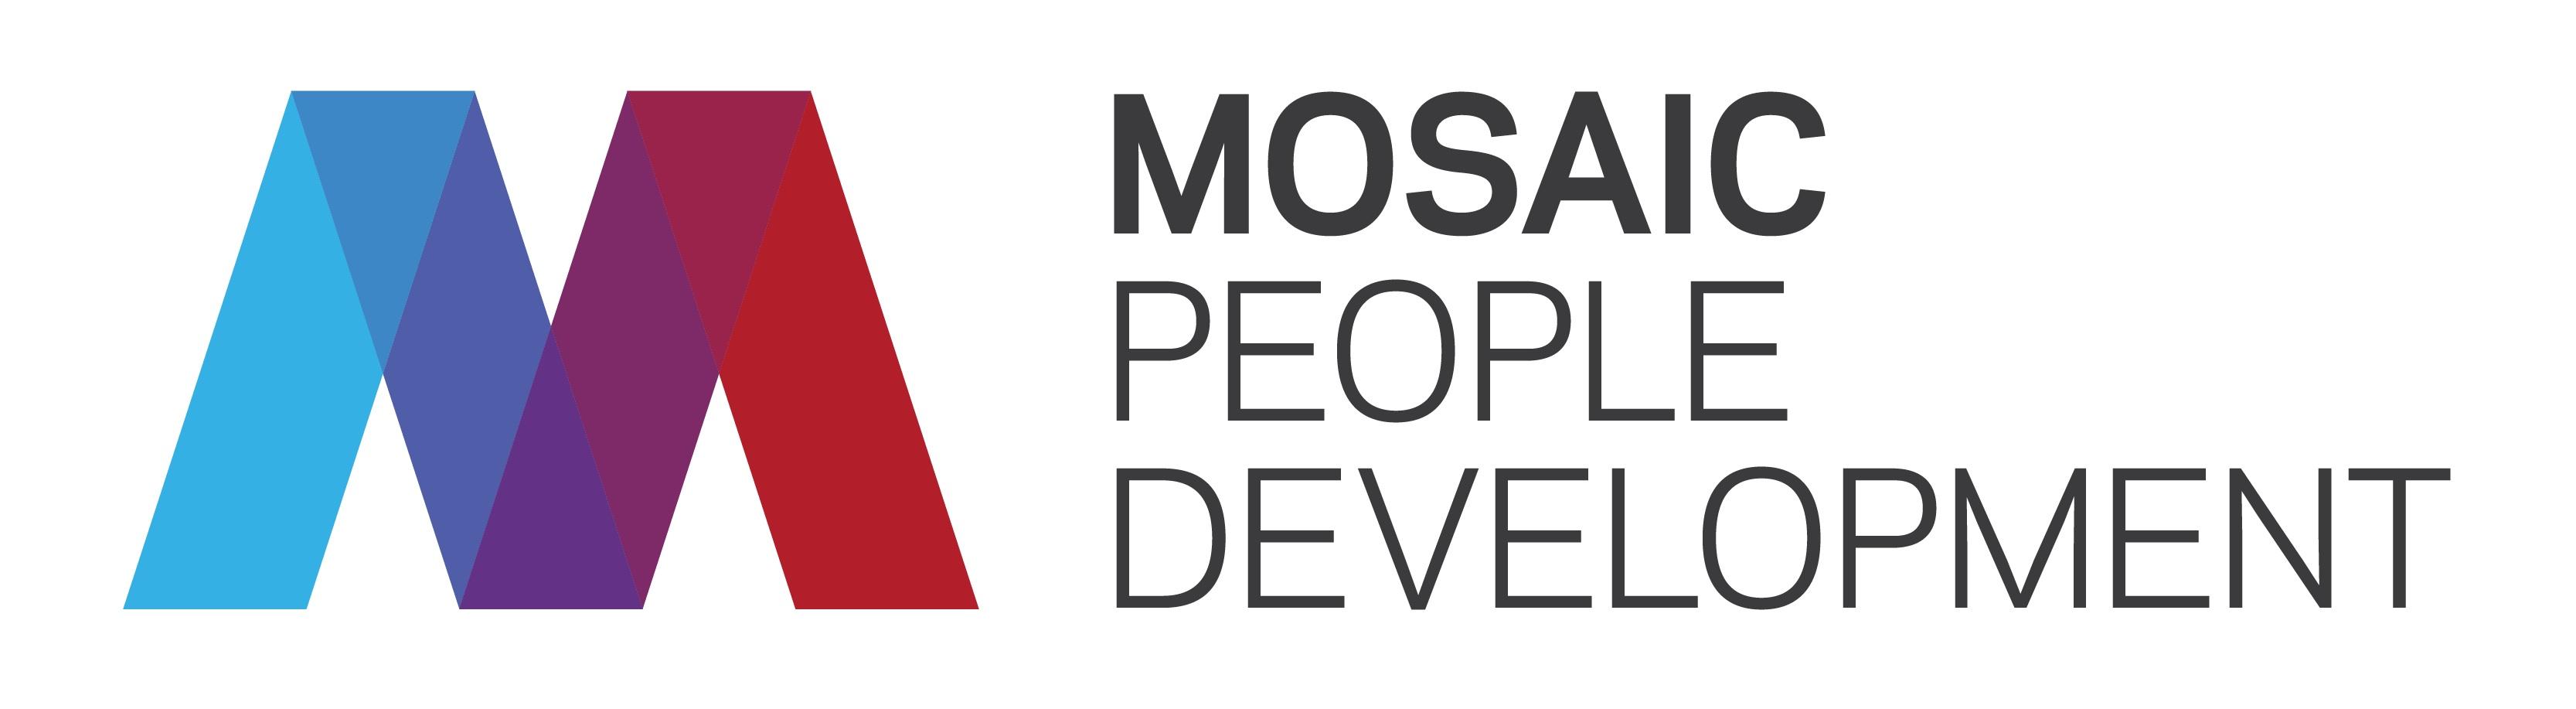 Mosaic People Development